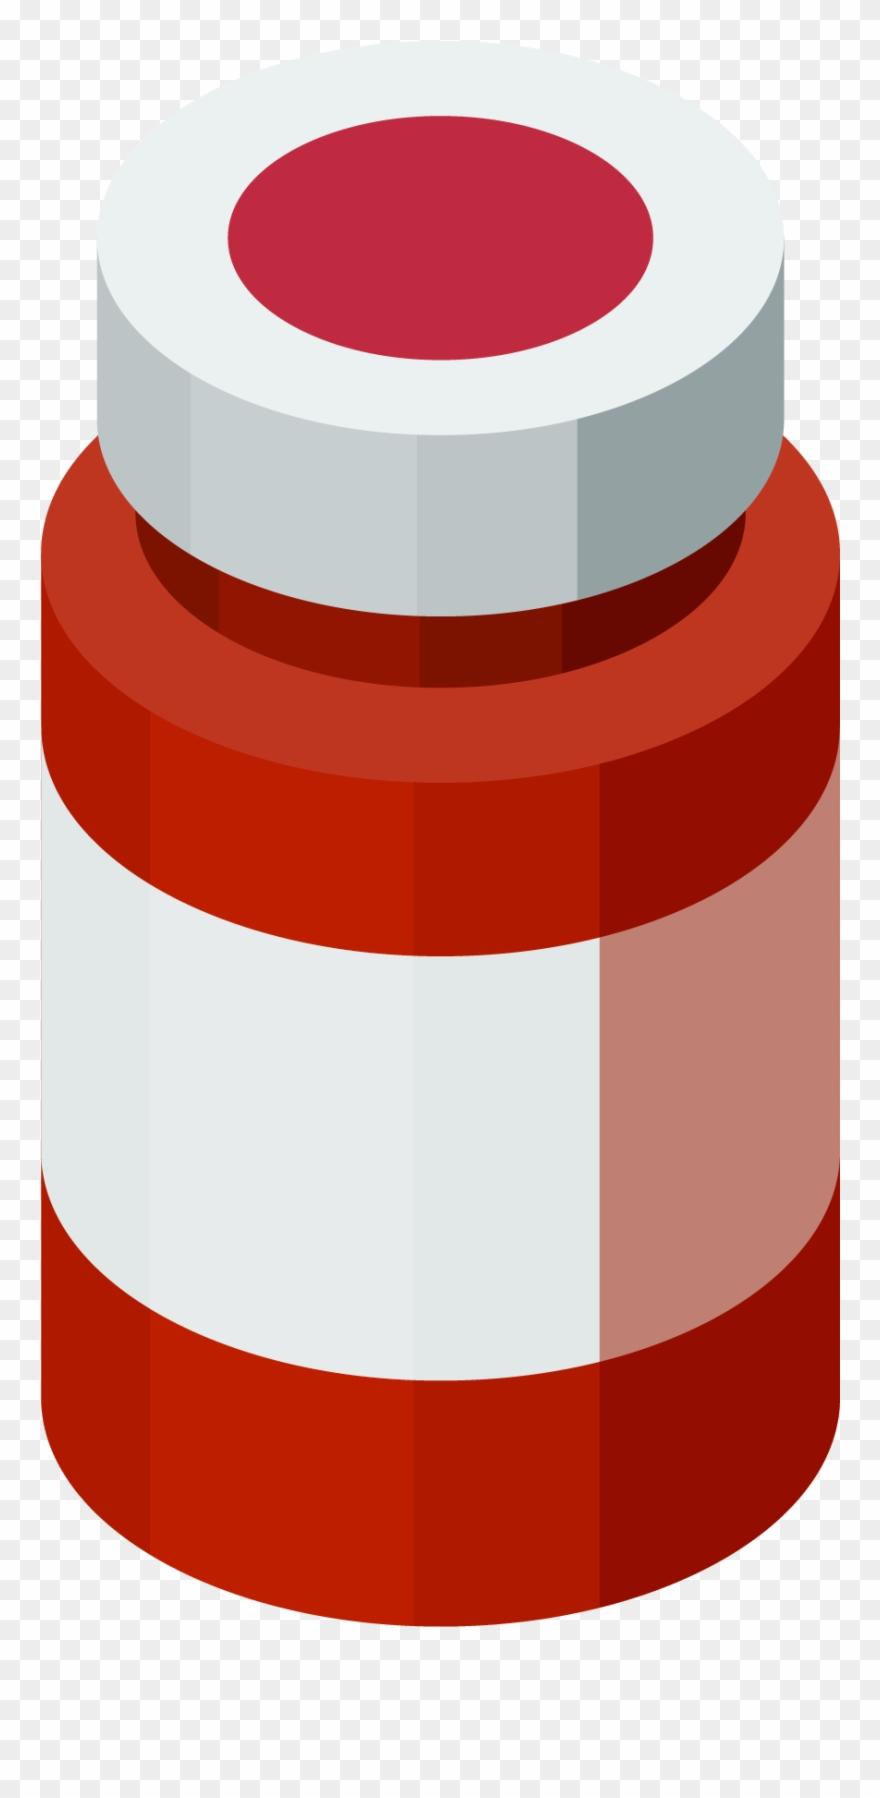 Medical Treatment Medicine Bottle Png And Vector Image.